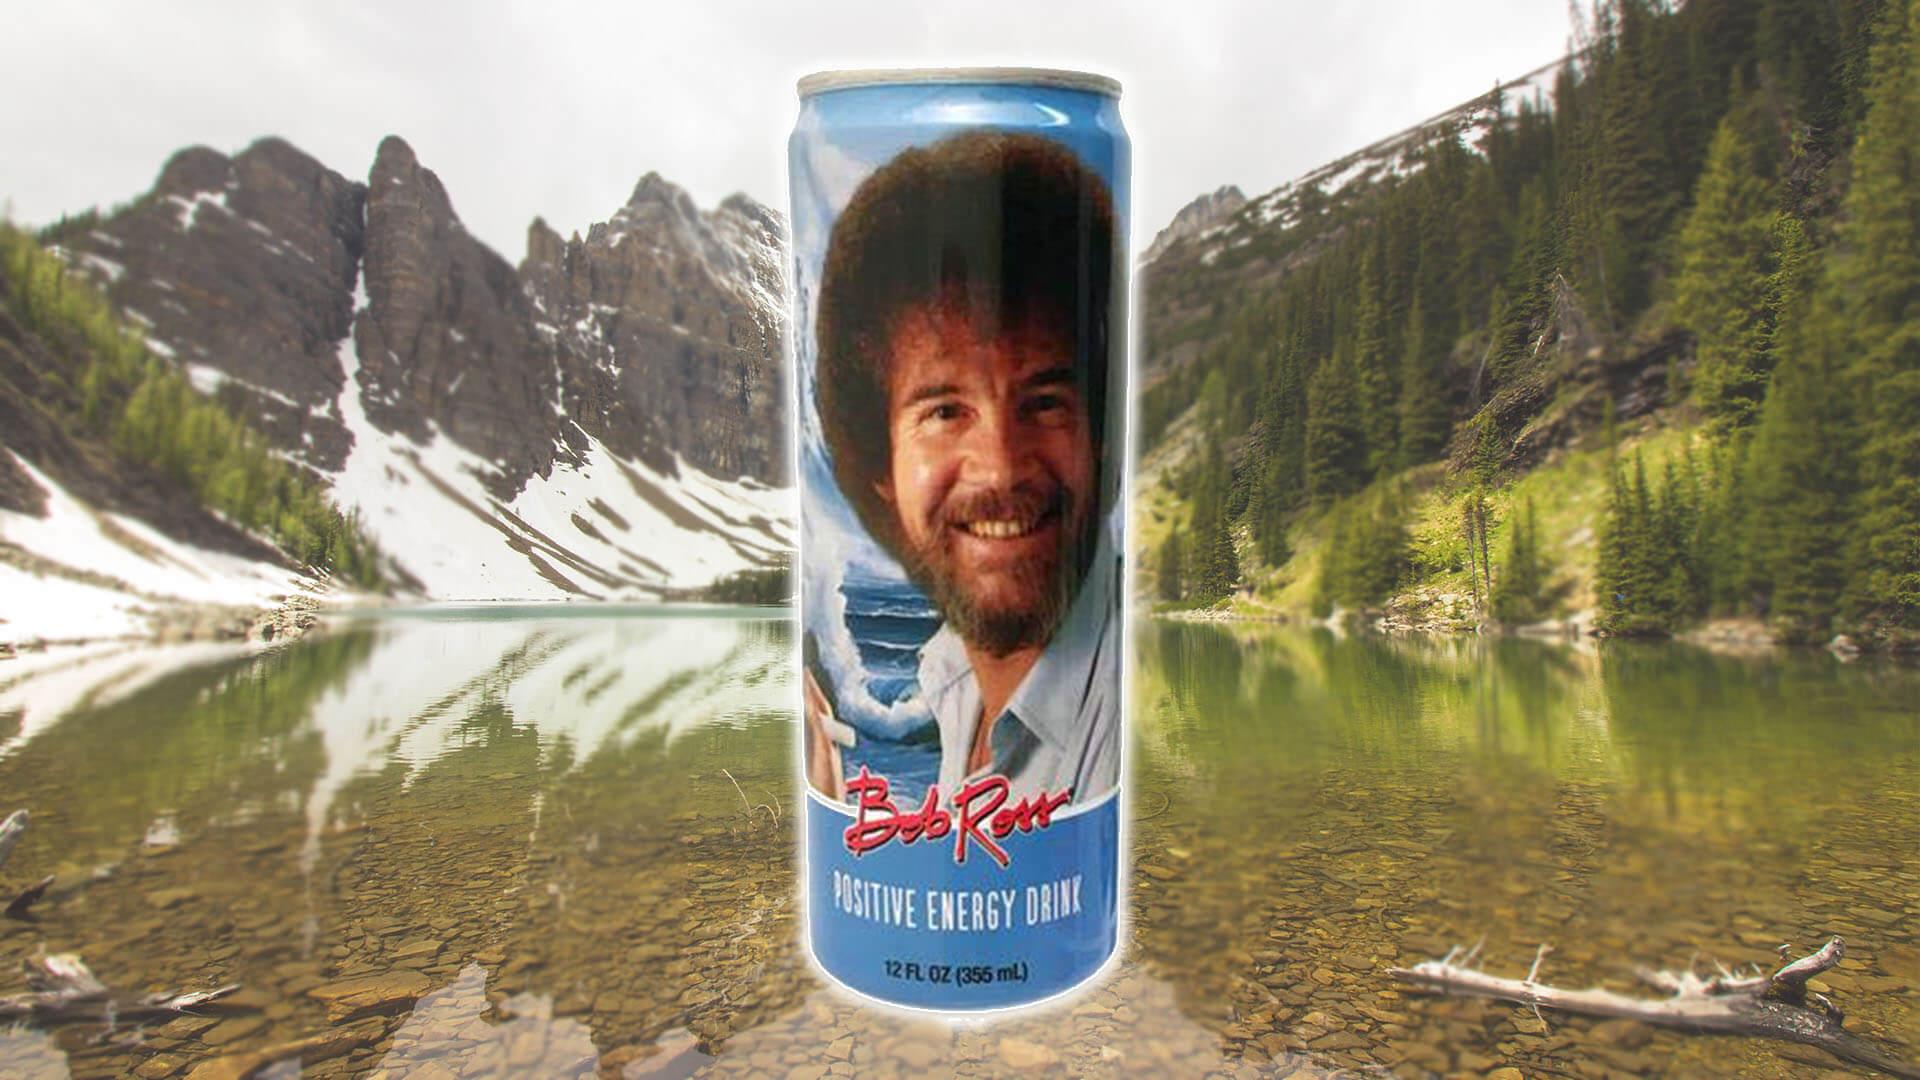 This Vegan Bob Ross Energy Drink Has 150% of the RDA for B12